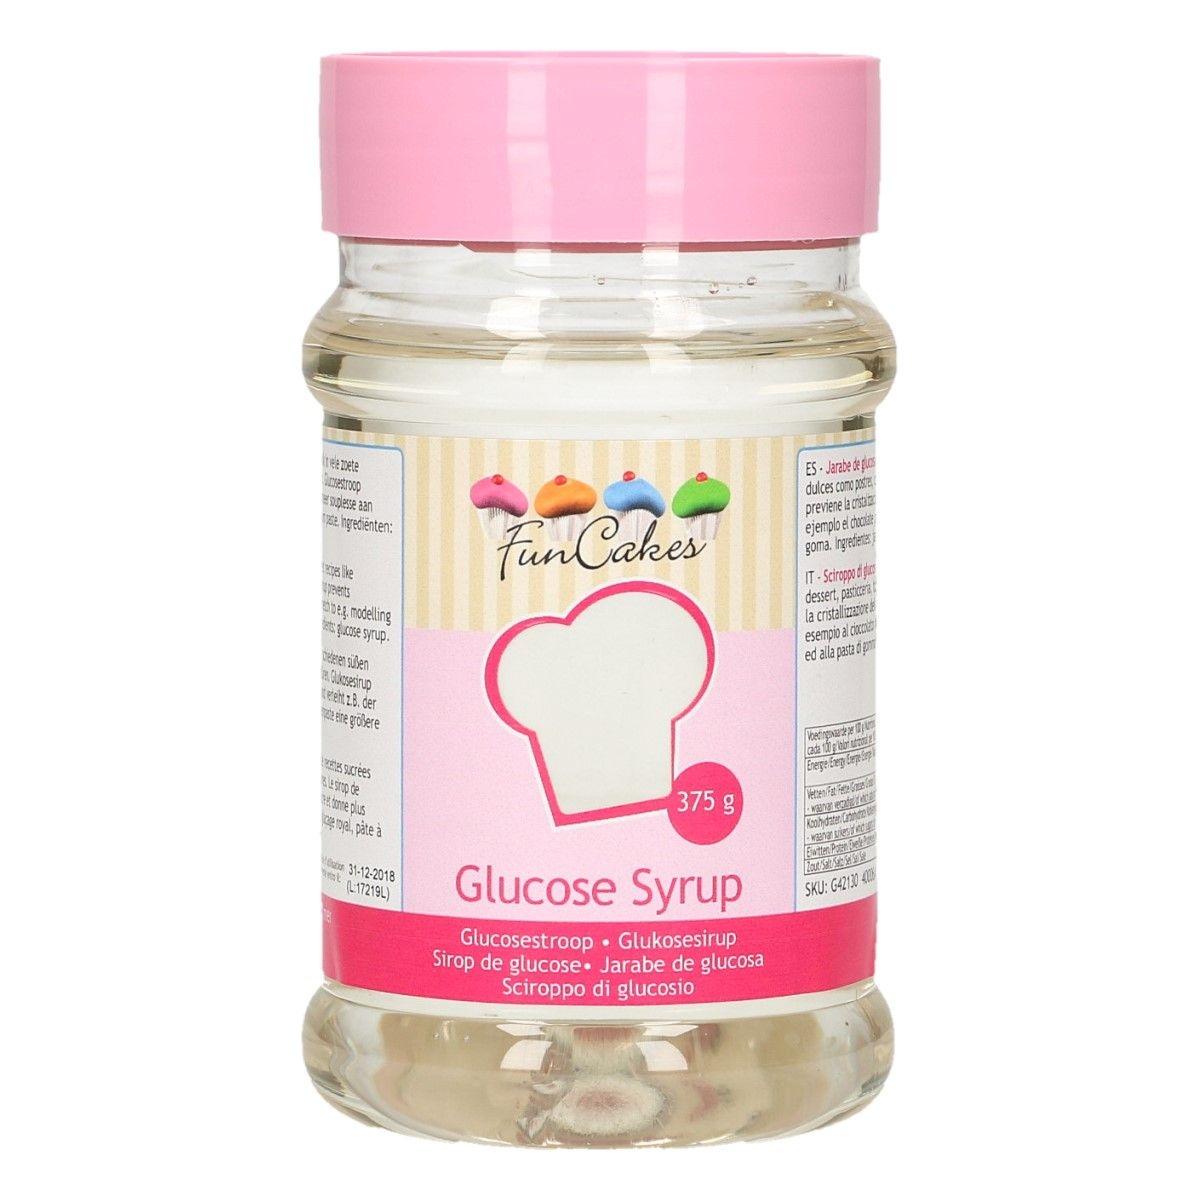 Glukose Sirup